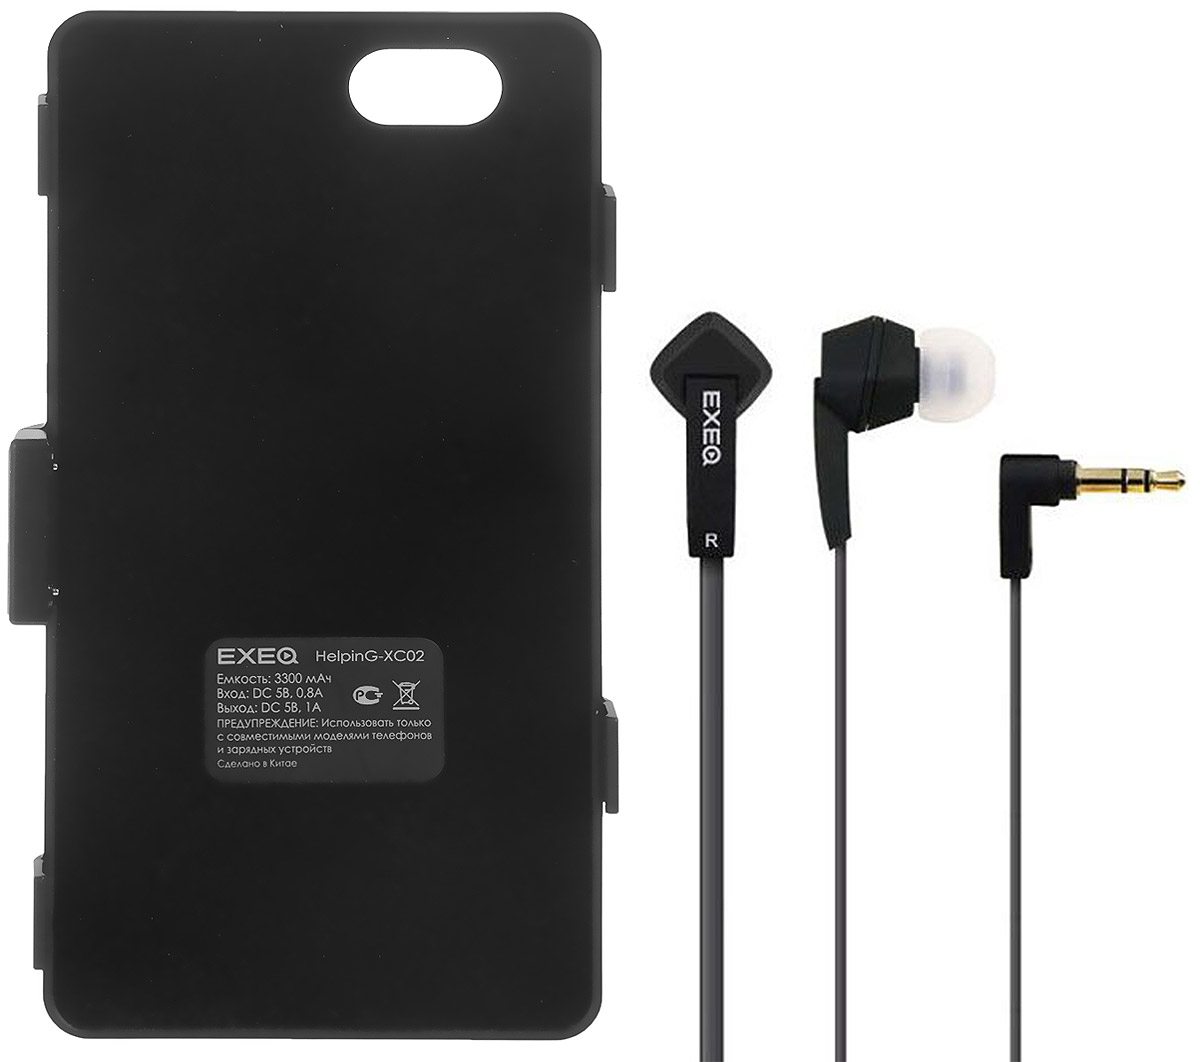 EXEQ HelpinG-XC02 чехол-аккумулятор для Sony Xperia Z1 Compact, Black (3300 мАч, клип-кейс)